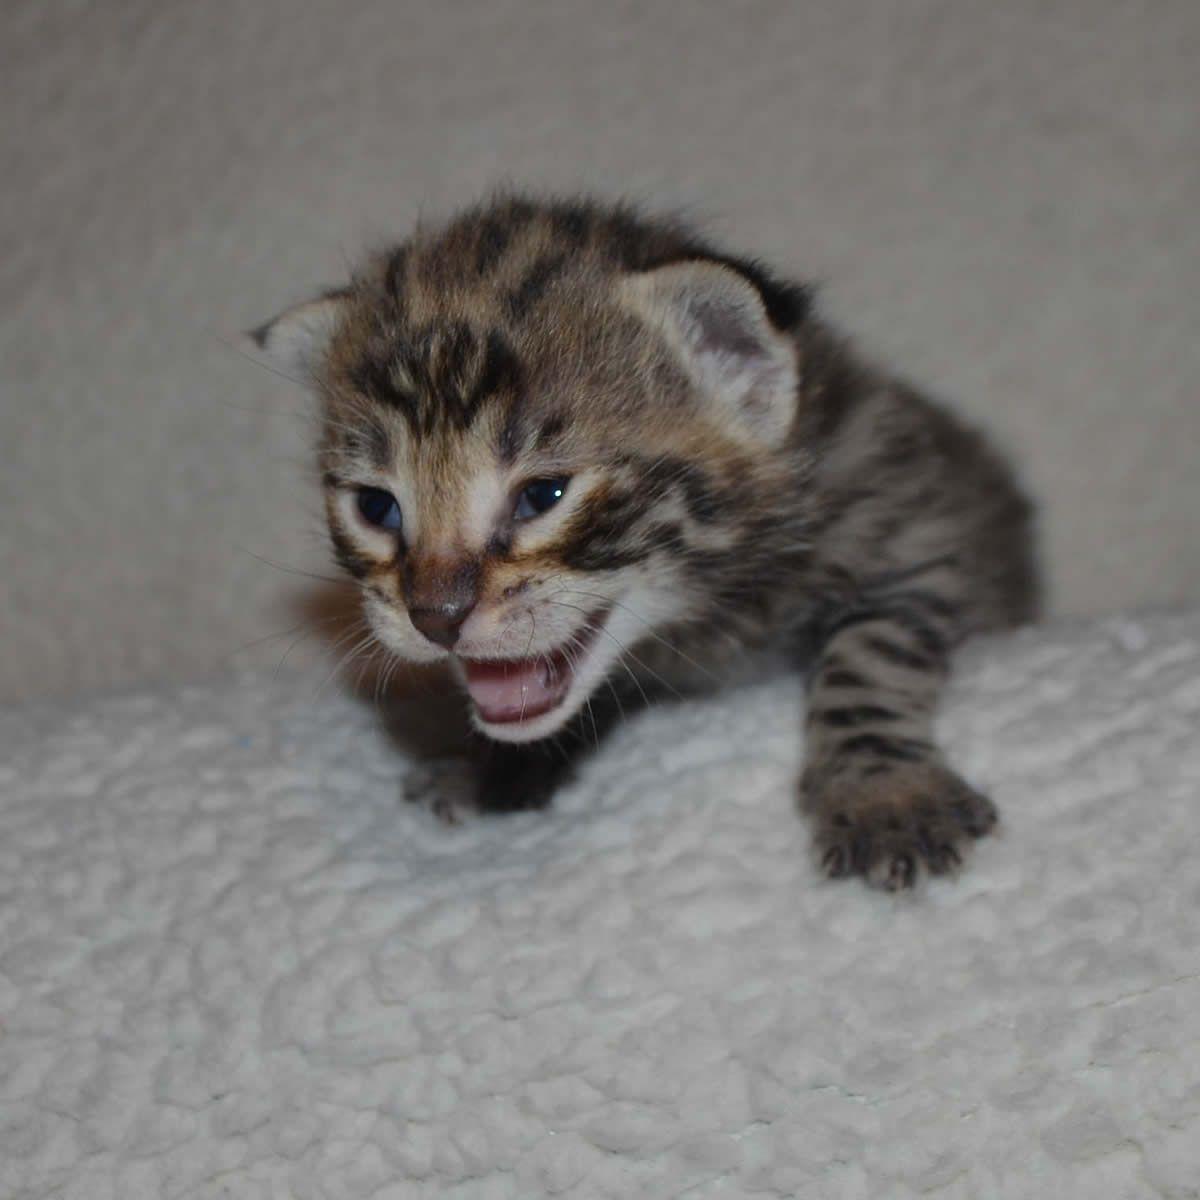 Pin By Amanukatz On Savannah Kittens Pictures Savannah Kitten Savannah Kittens For Sale Savannah Cat Price